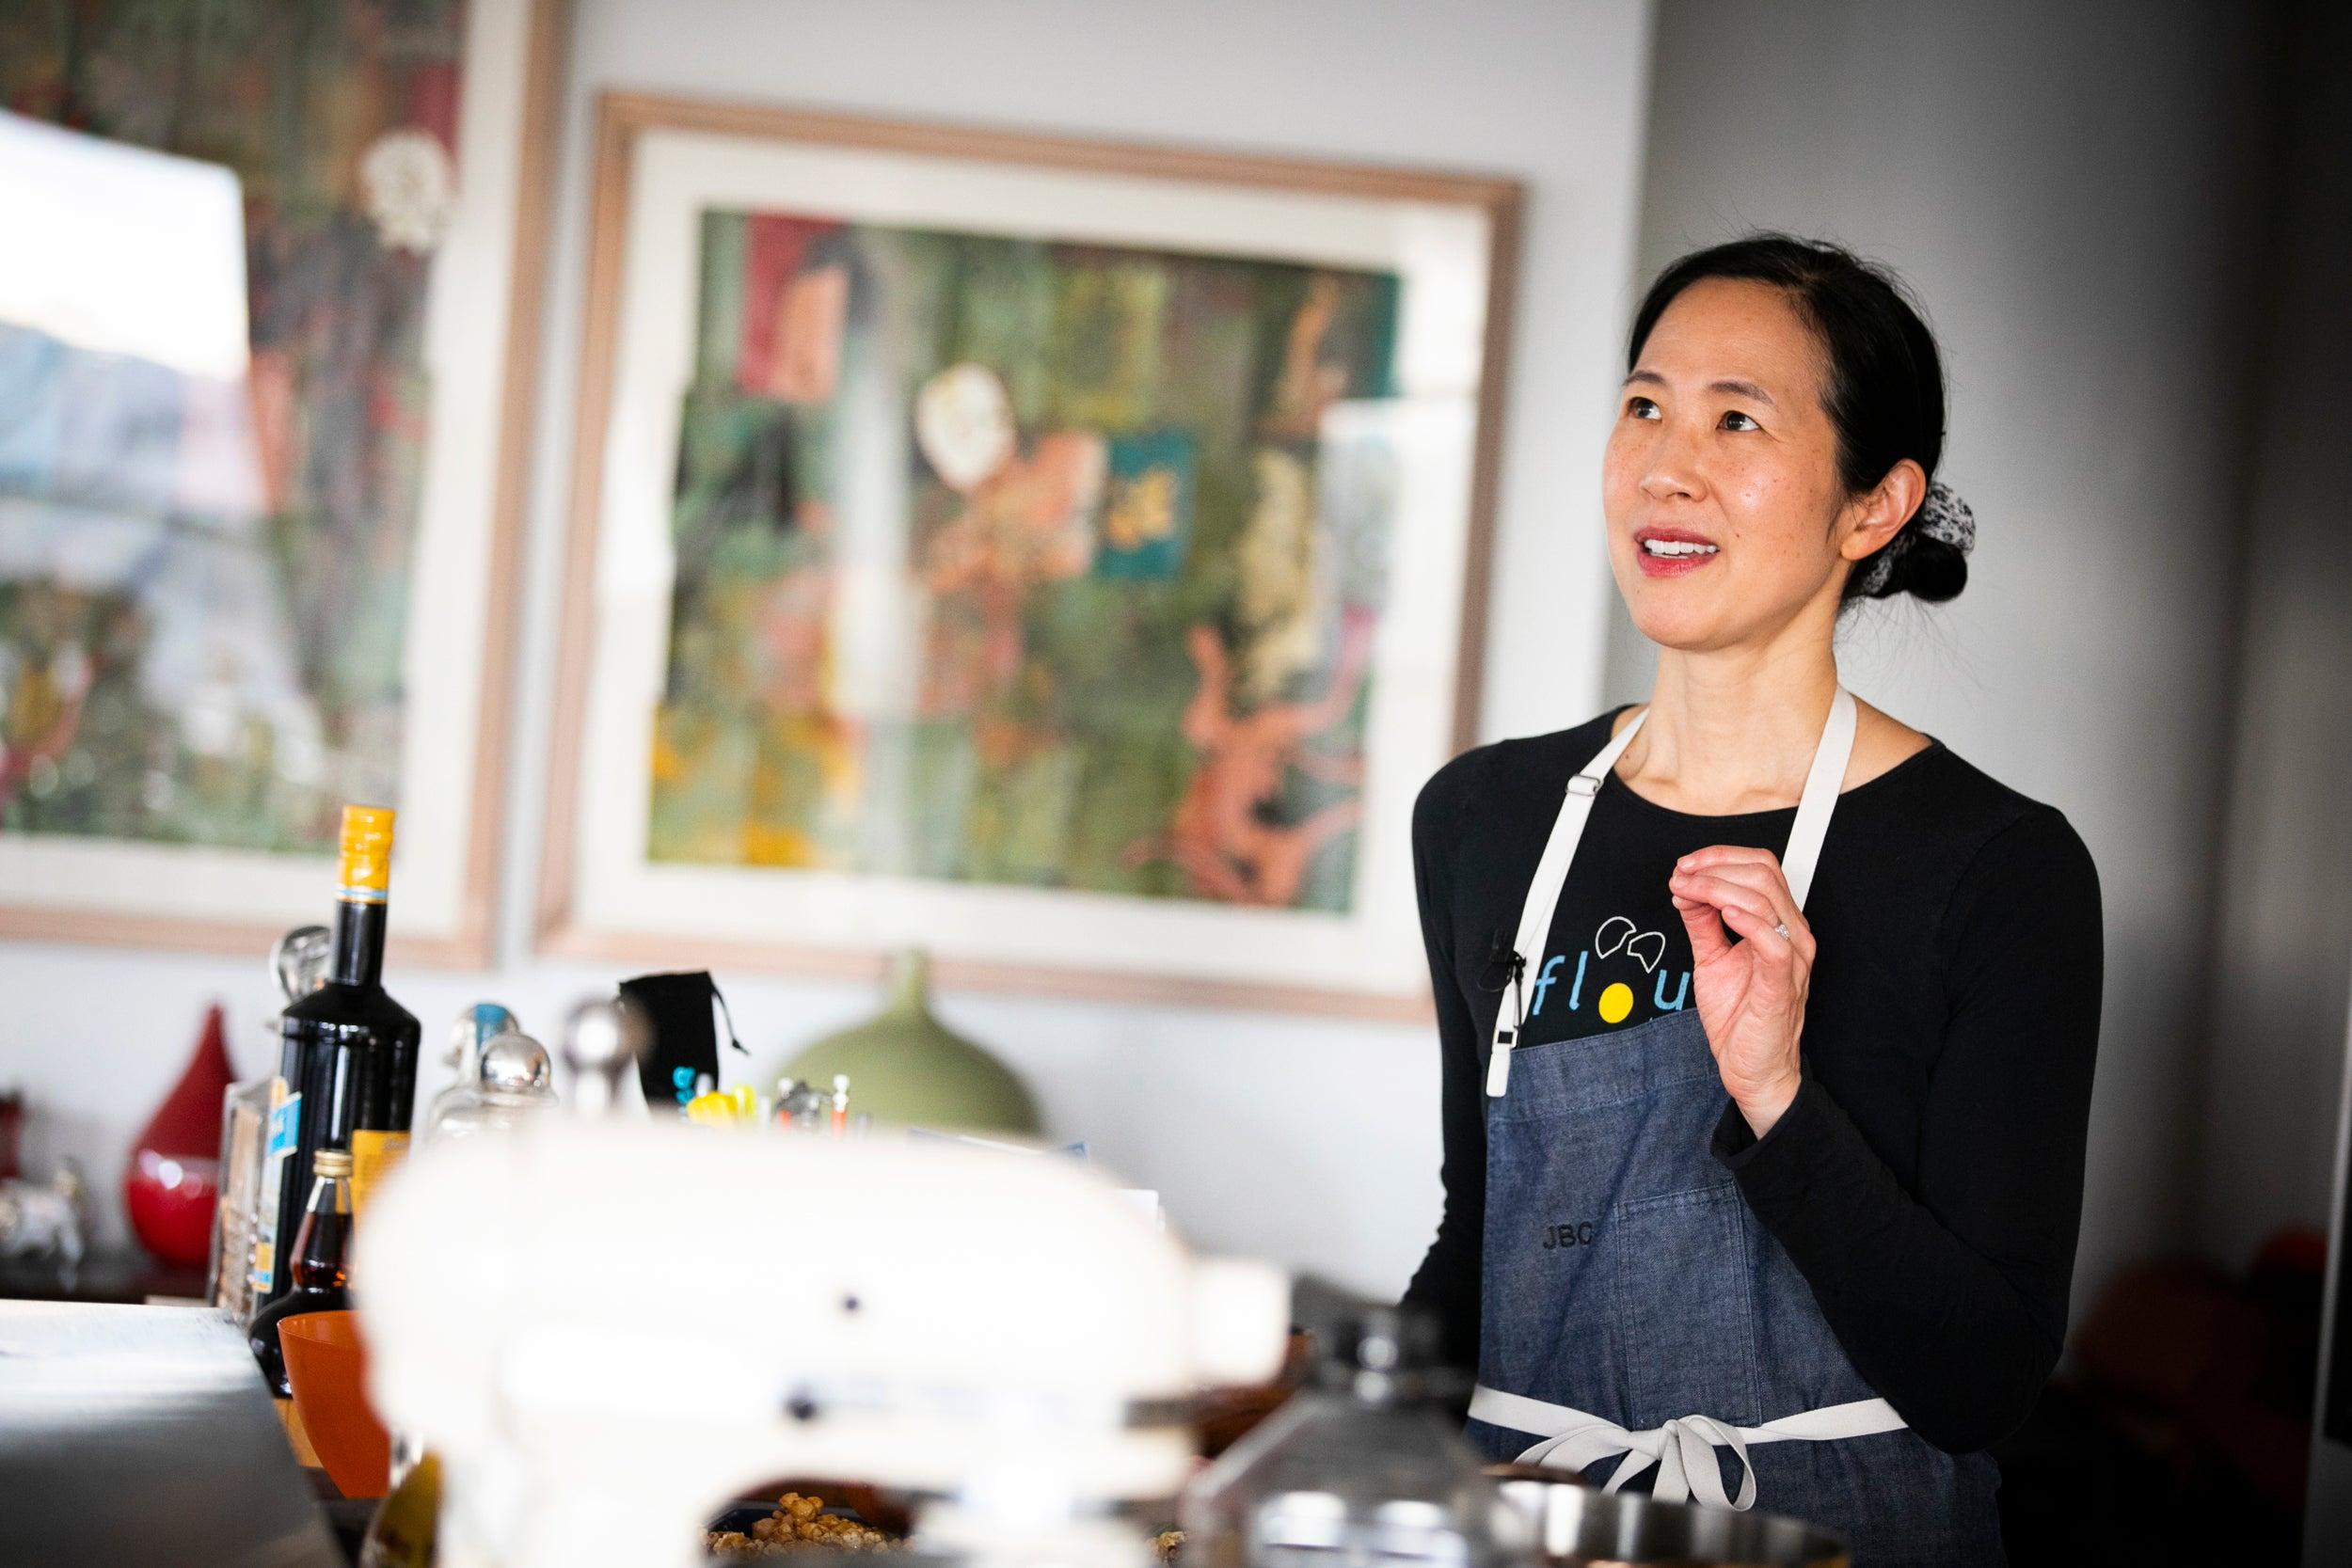 Joanne Chang makes a twist on popular sticky buns